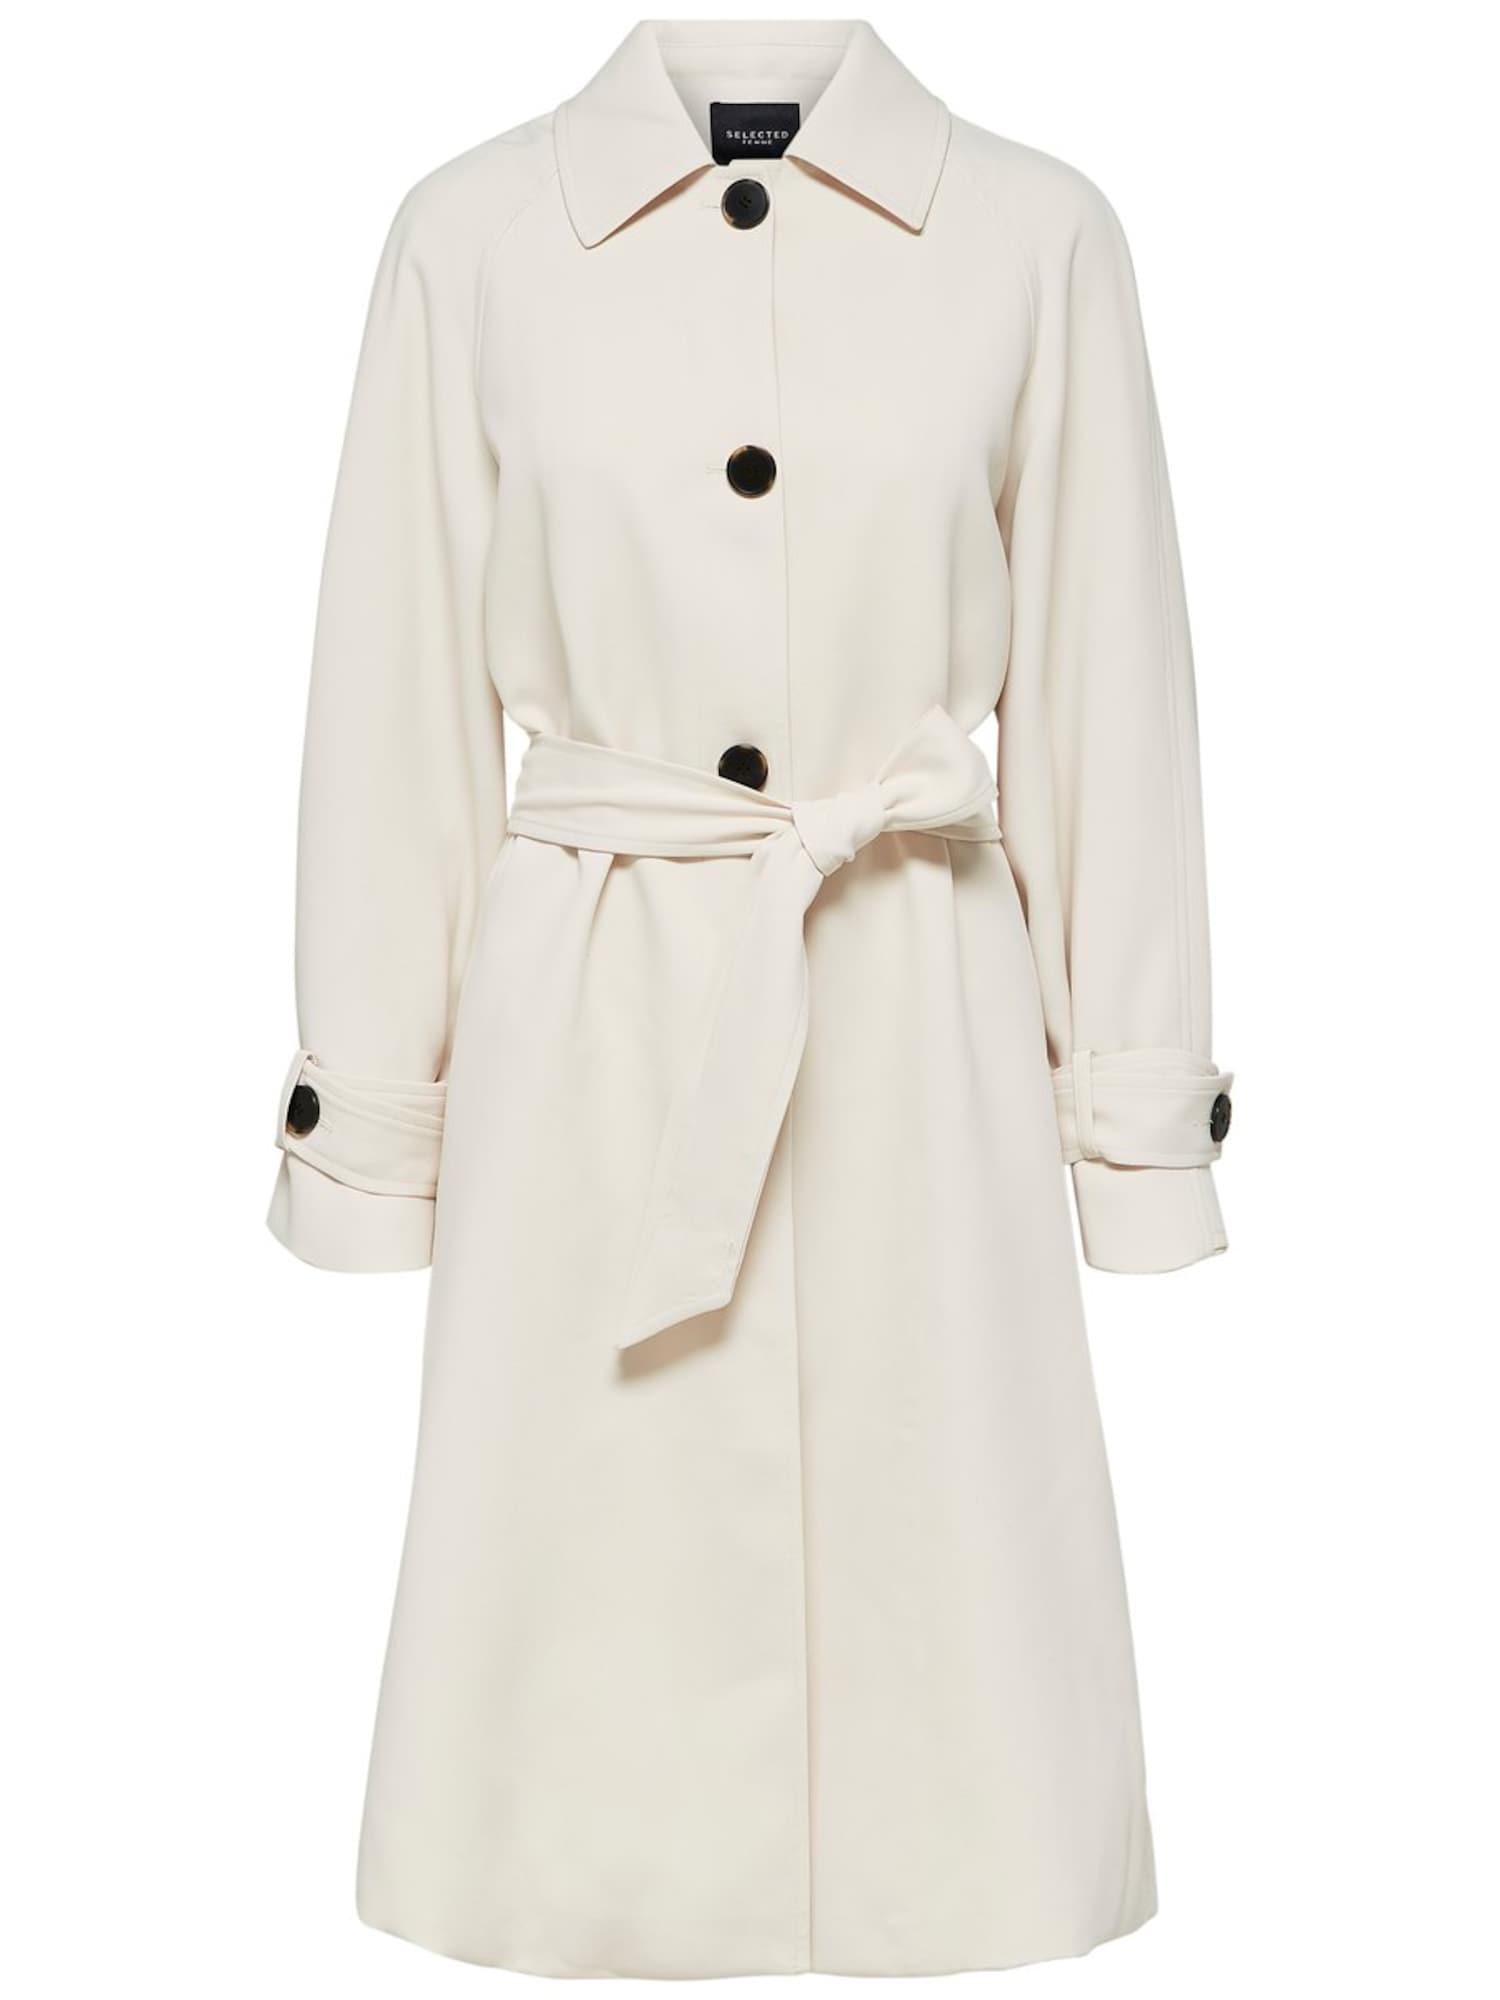 Trenchcoat   Bekleidung > Mäntel > Trenchcoats   Creme   Selected Femme